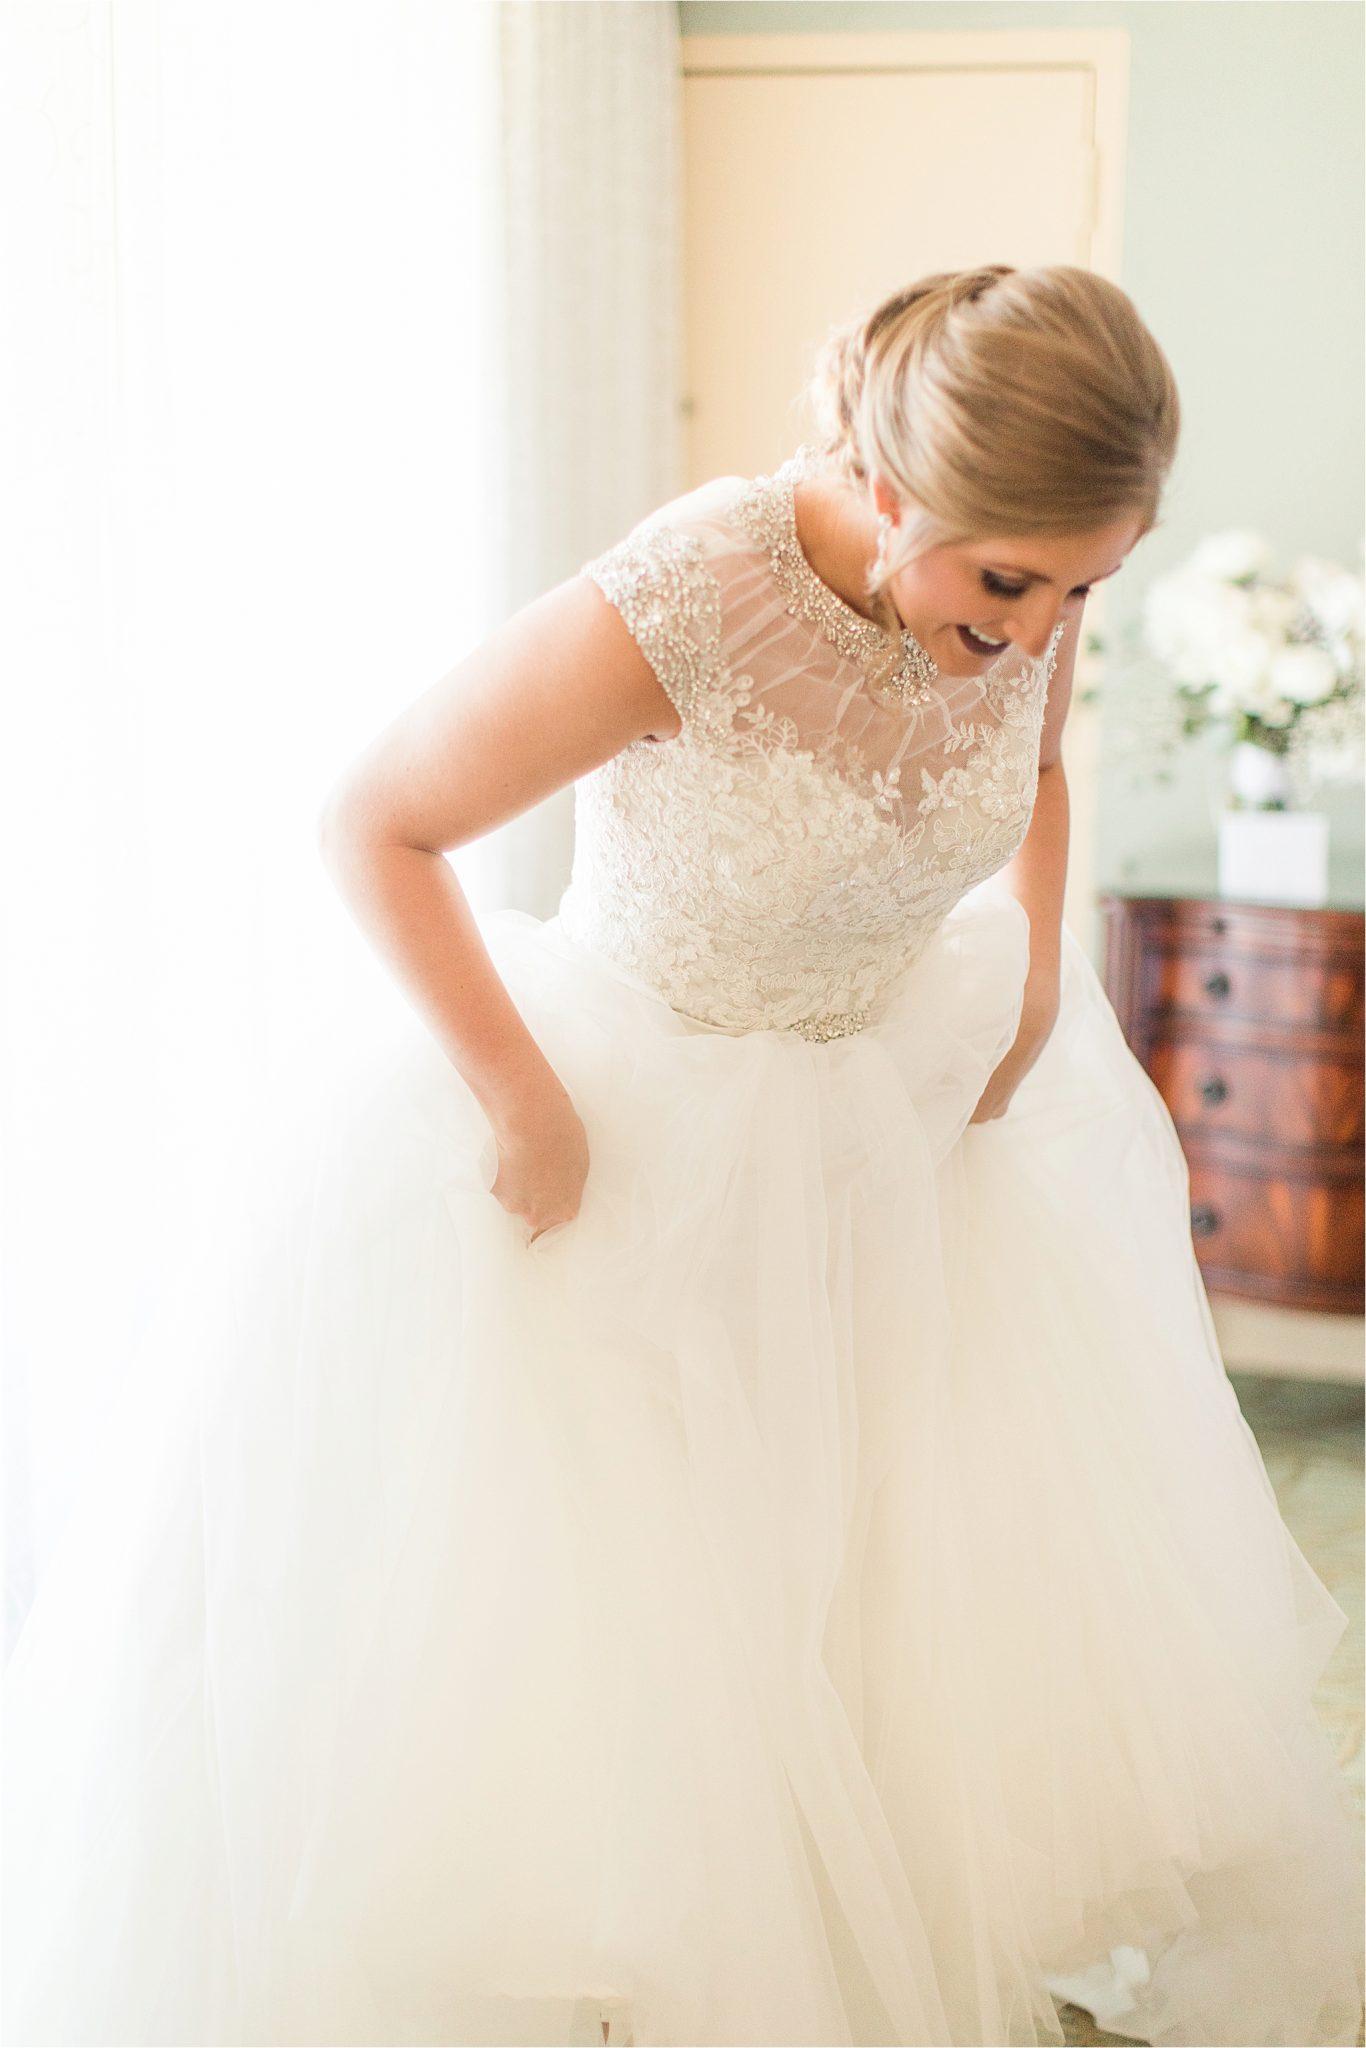 Winter Wedding-Neutral Wedding-Alabama Bride-St Francis at the Point-White Lace Wedding Dress